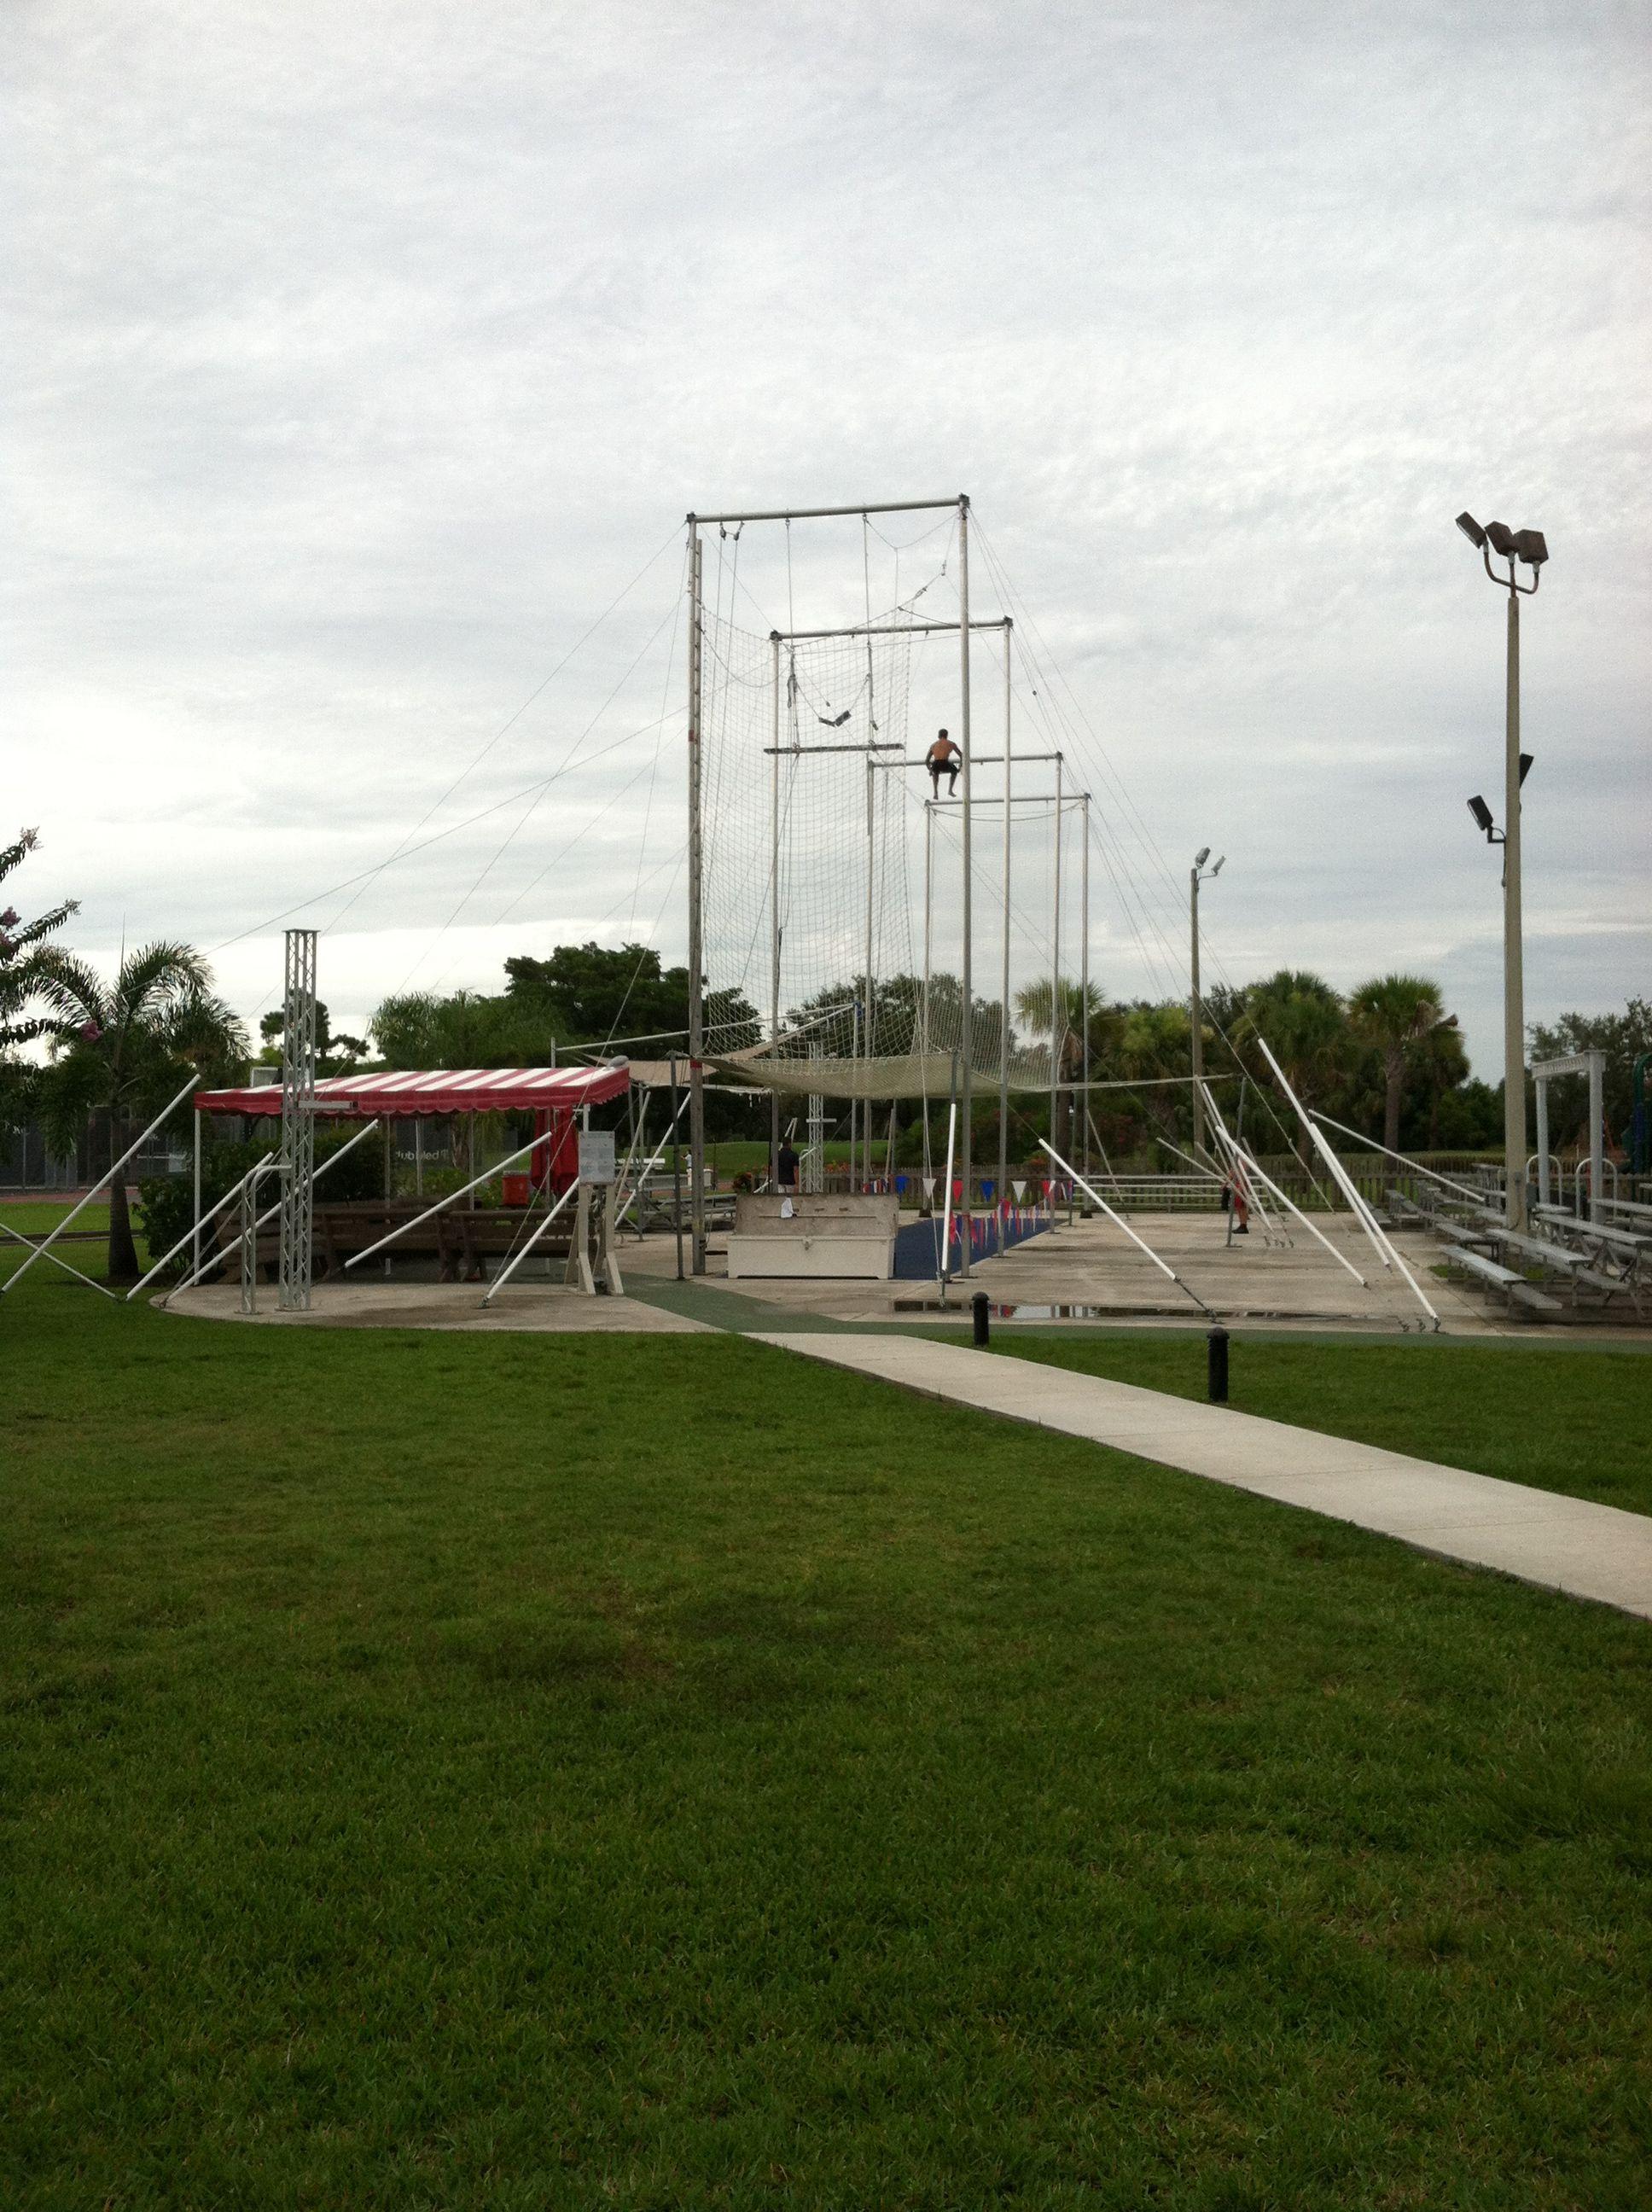 Flying trapeze school club med sandpiper bay all